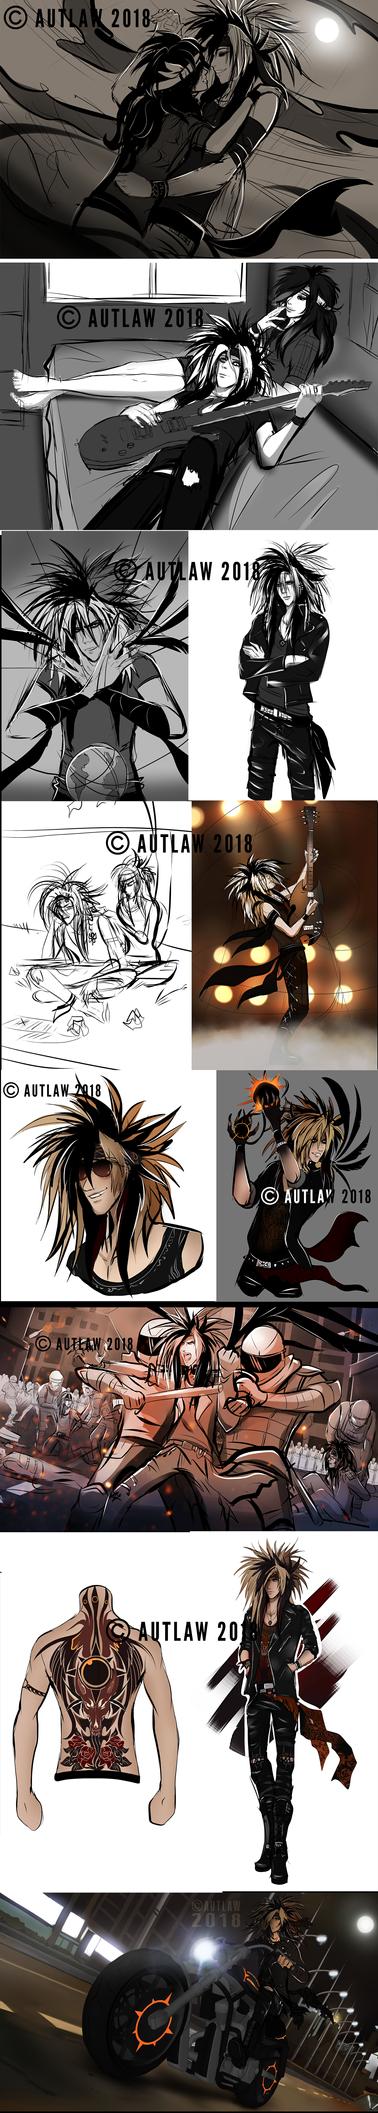 Shinri sketchdump and W.I.P. by Autlaw